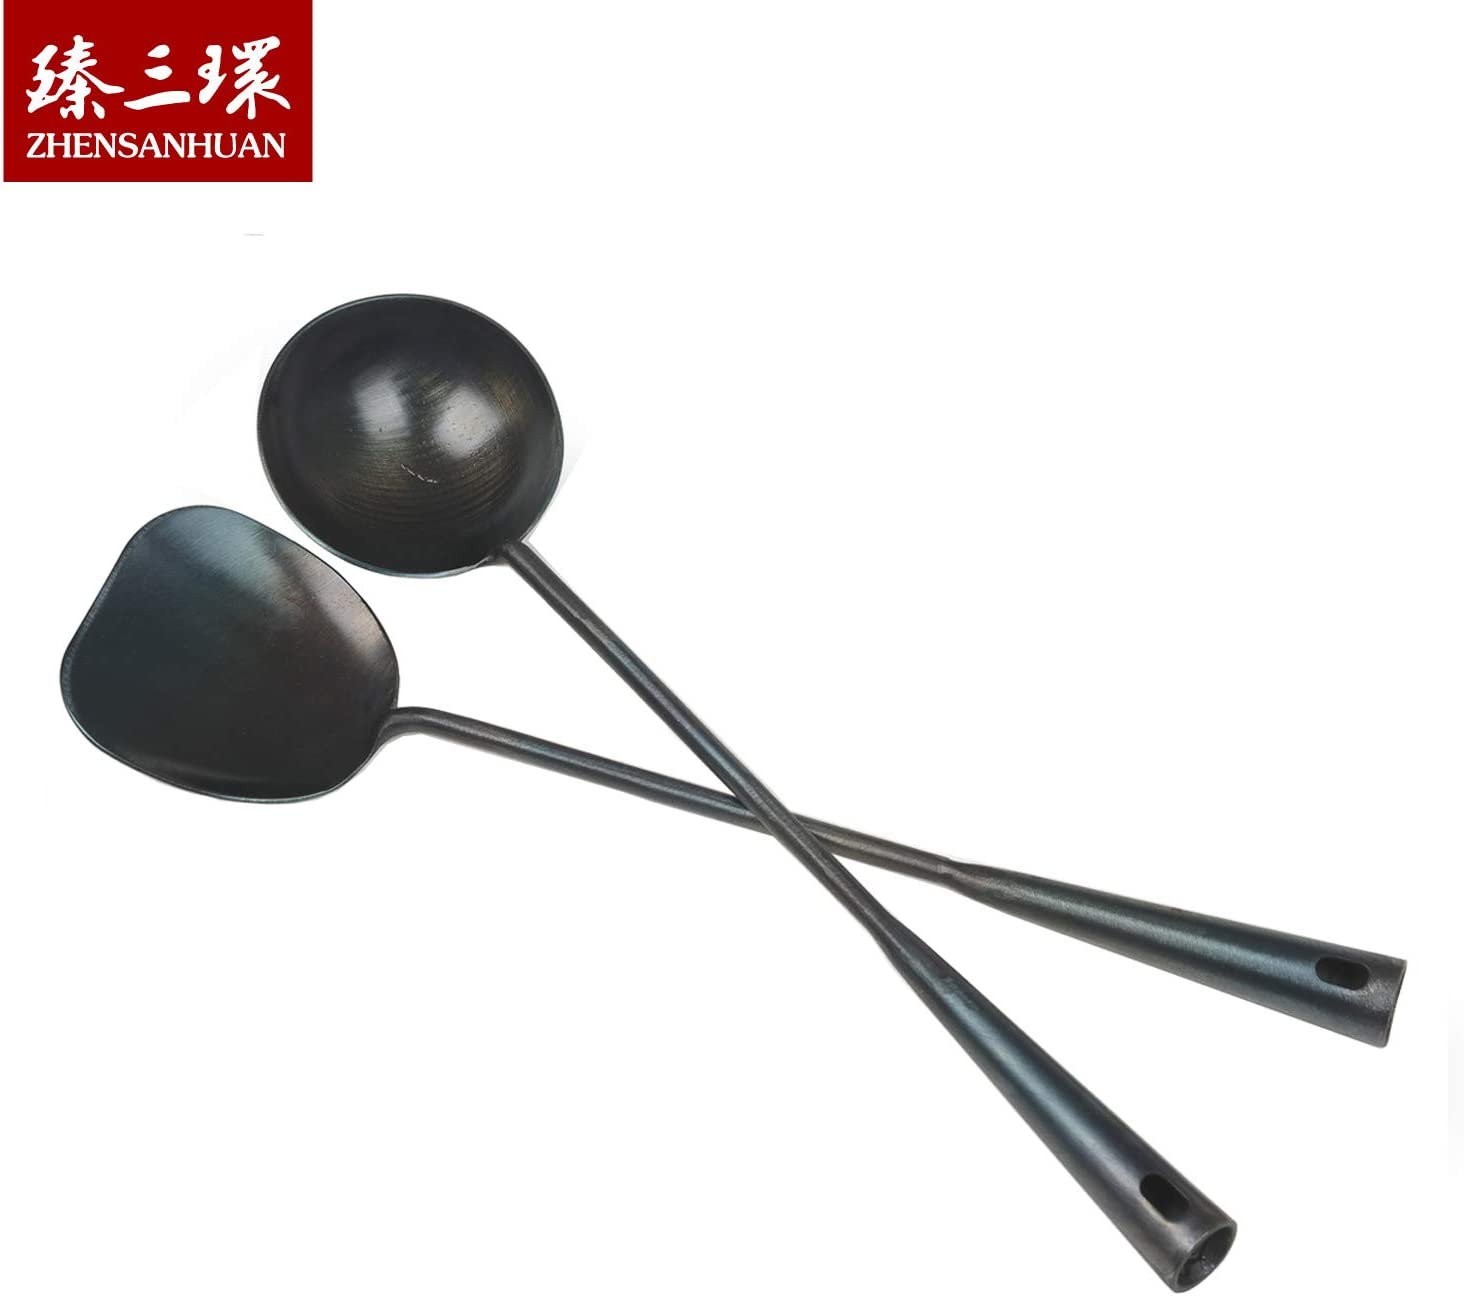 ZhenSanHuan Chinese Traditional Hand Hammered Iron Ladle & spatula/turner (Spatula & Ladle Set)